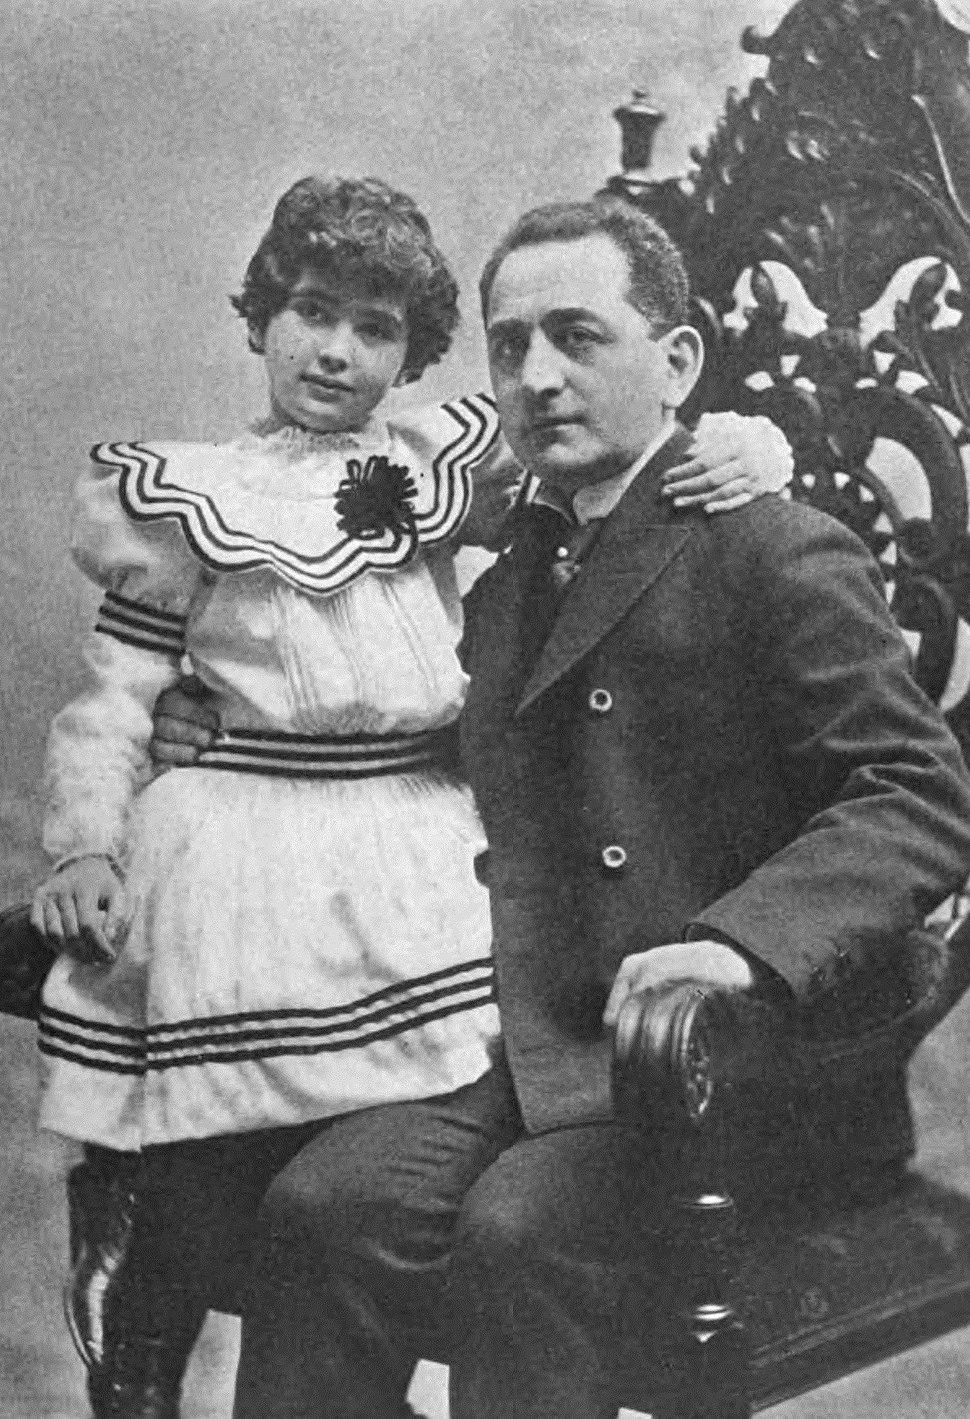 Adolph-and-iphigene-ochs-1902